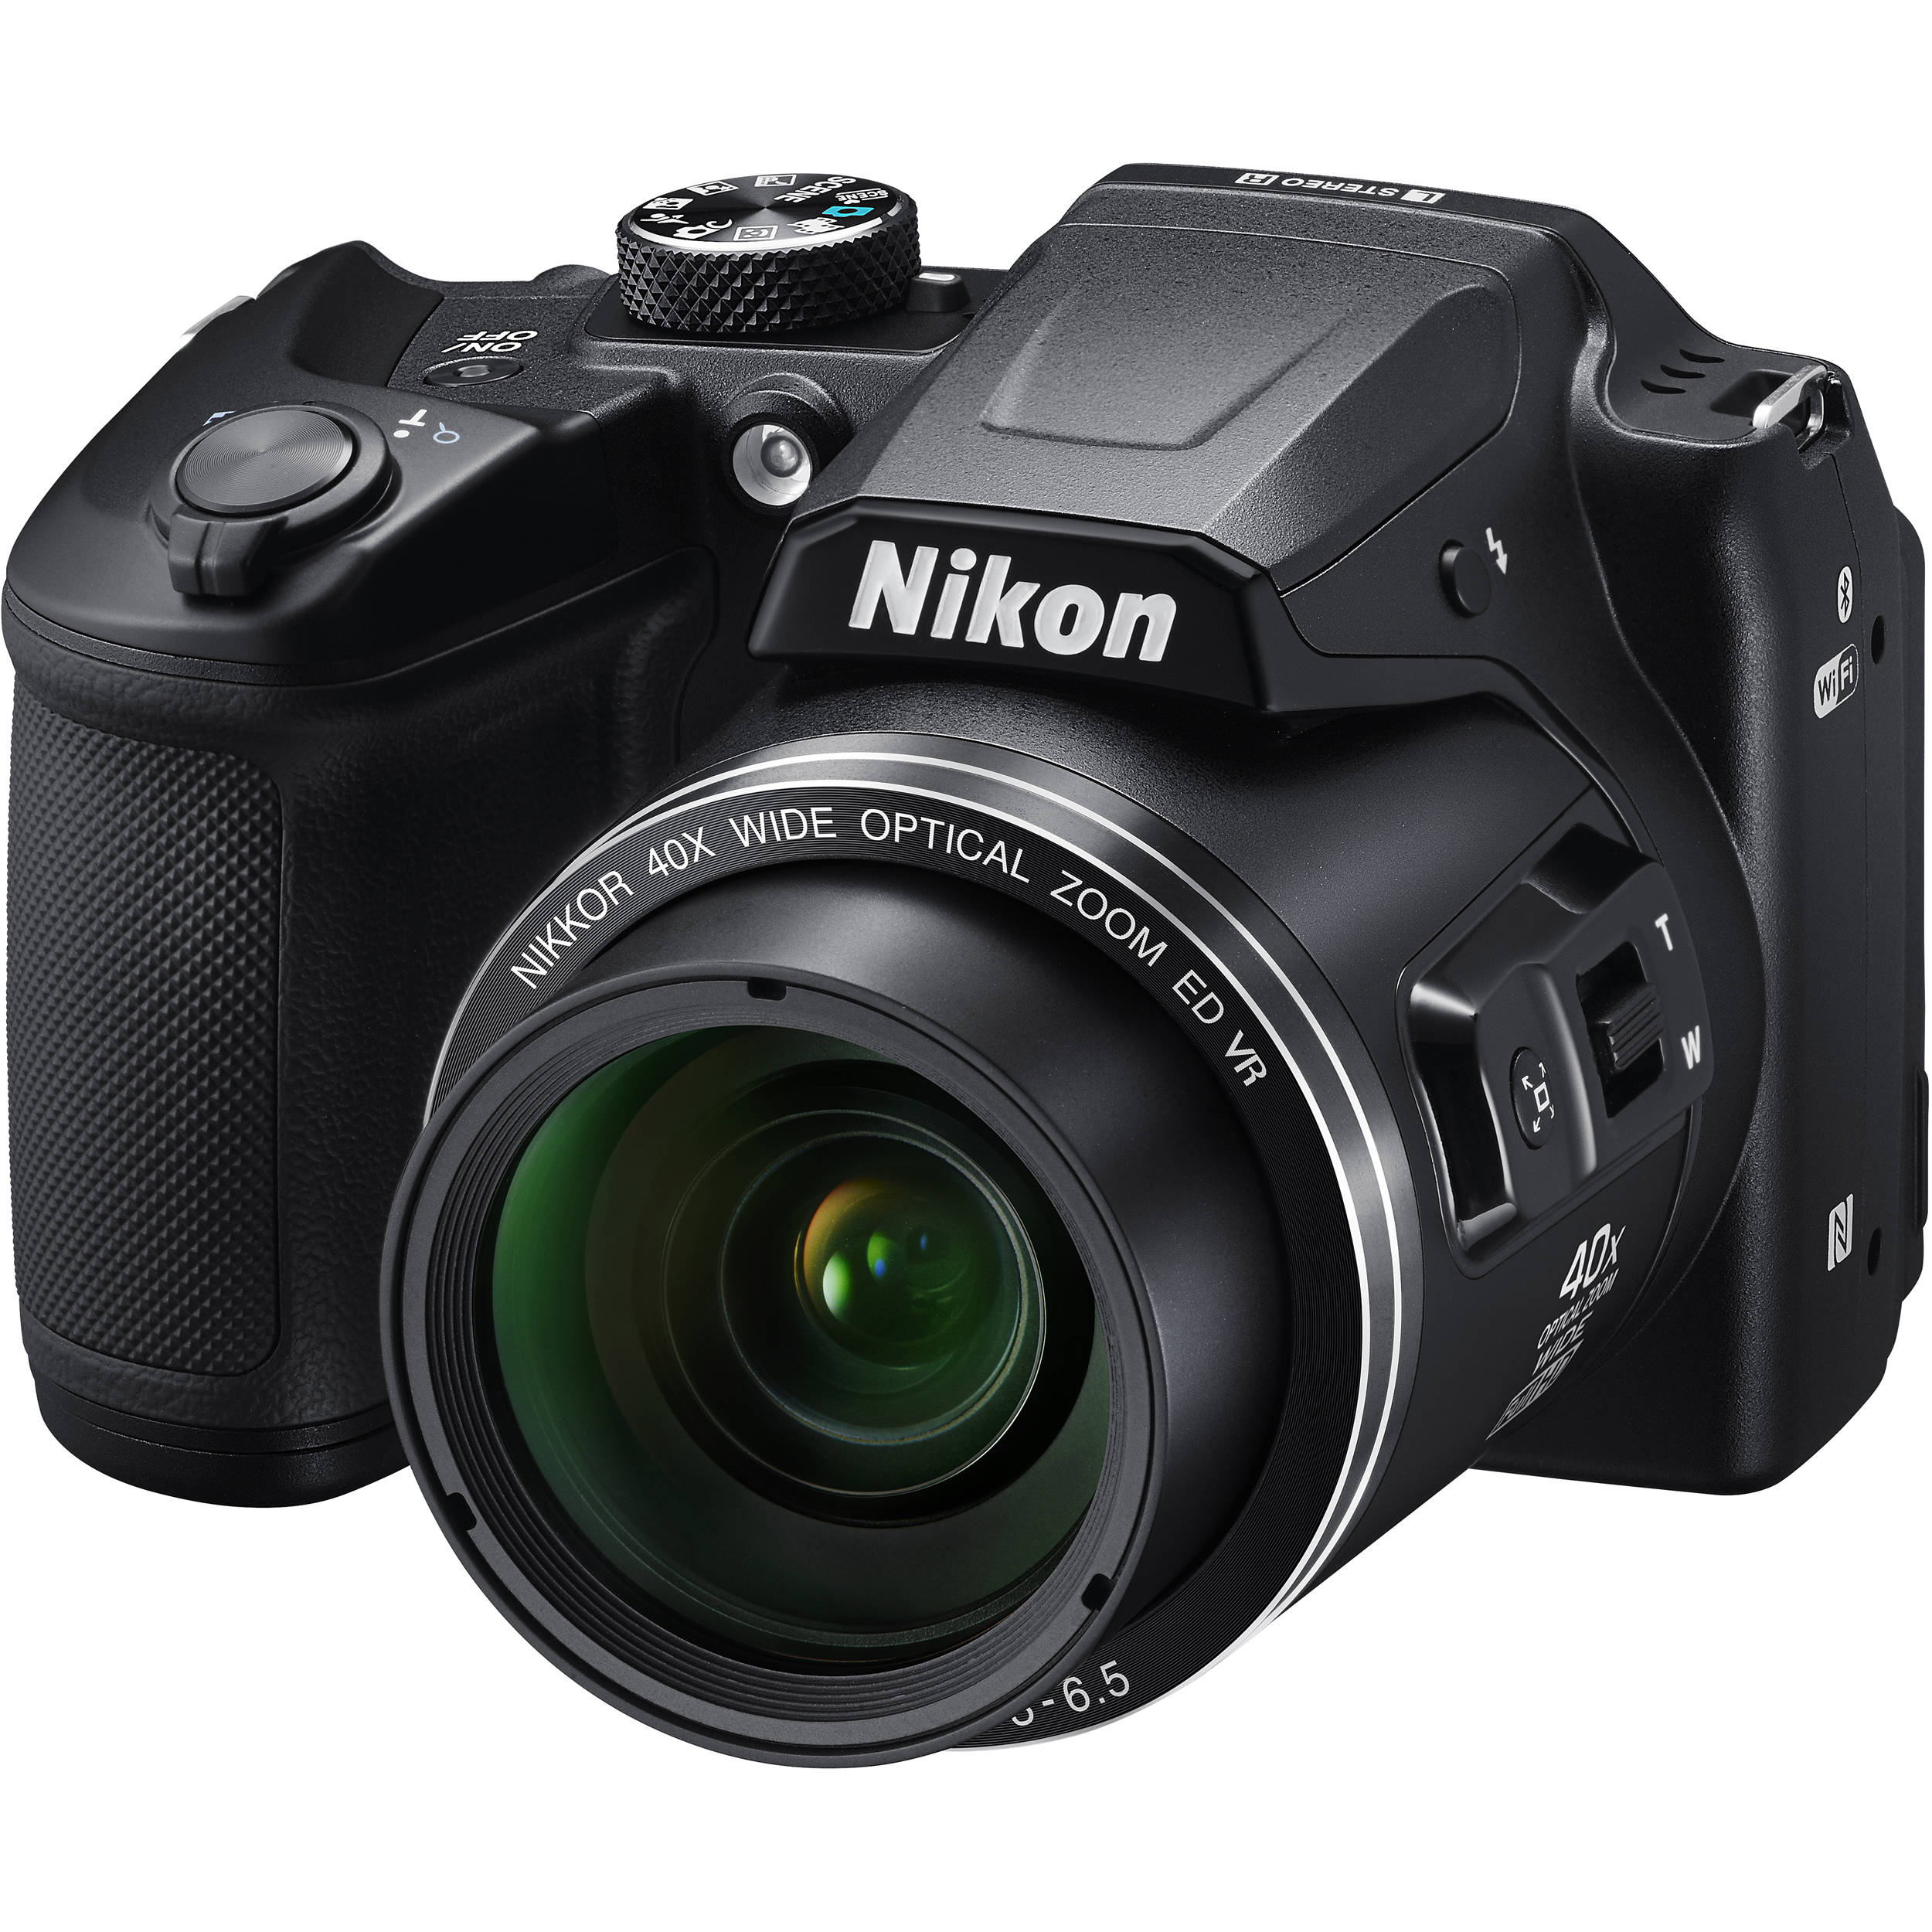 Nikon COOLPIX B500 Digital Camera (Black) 26506 B&H Photo Video